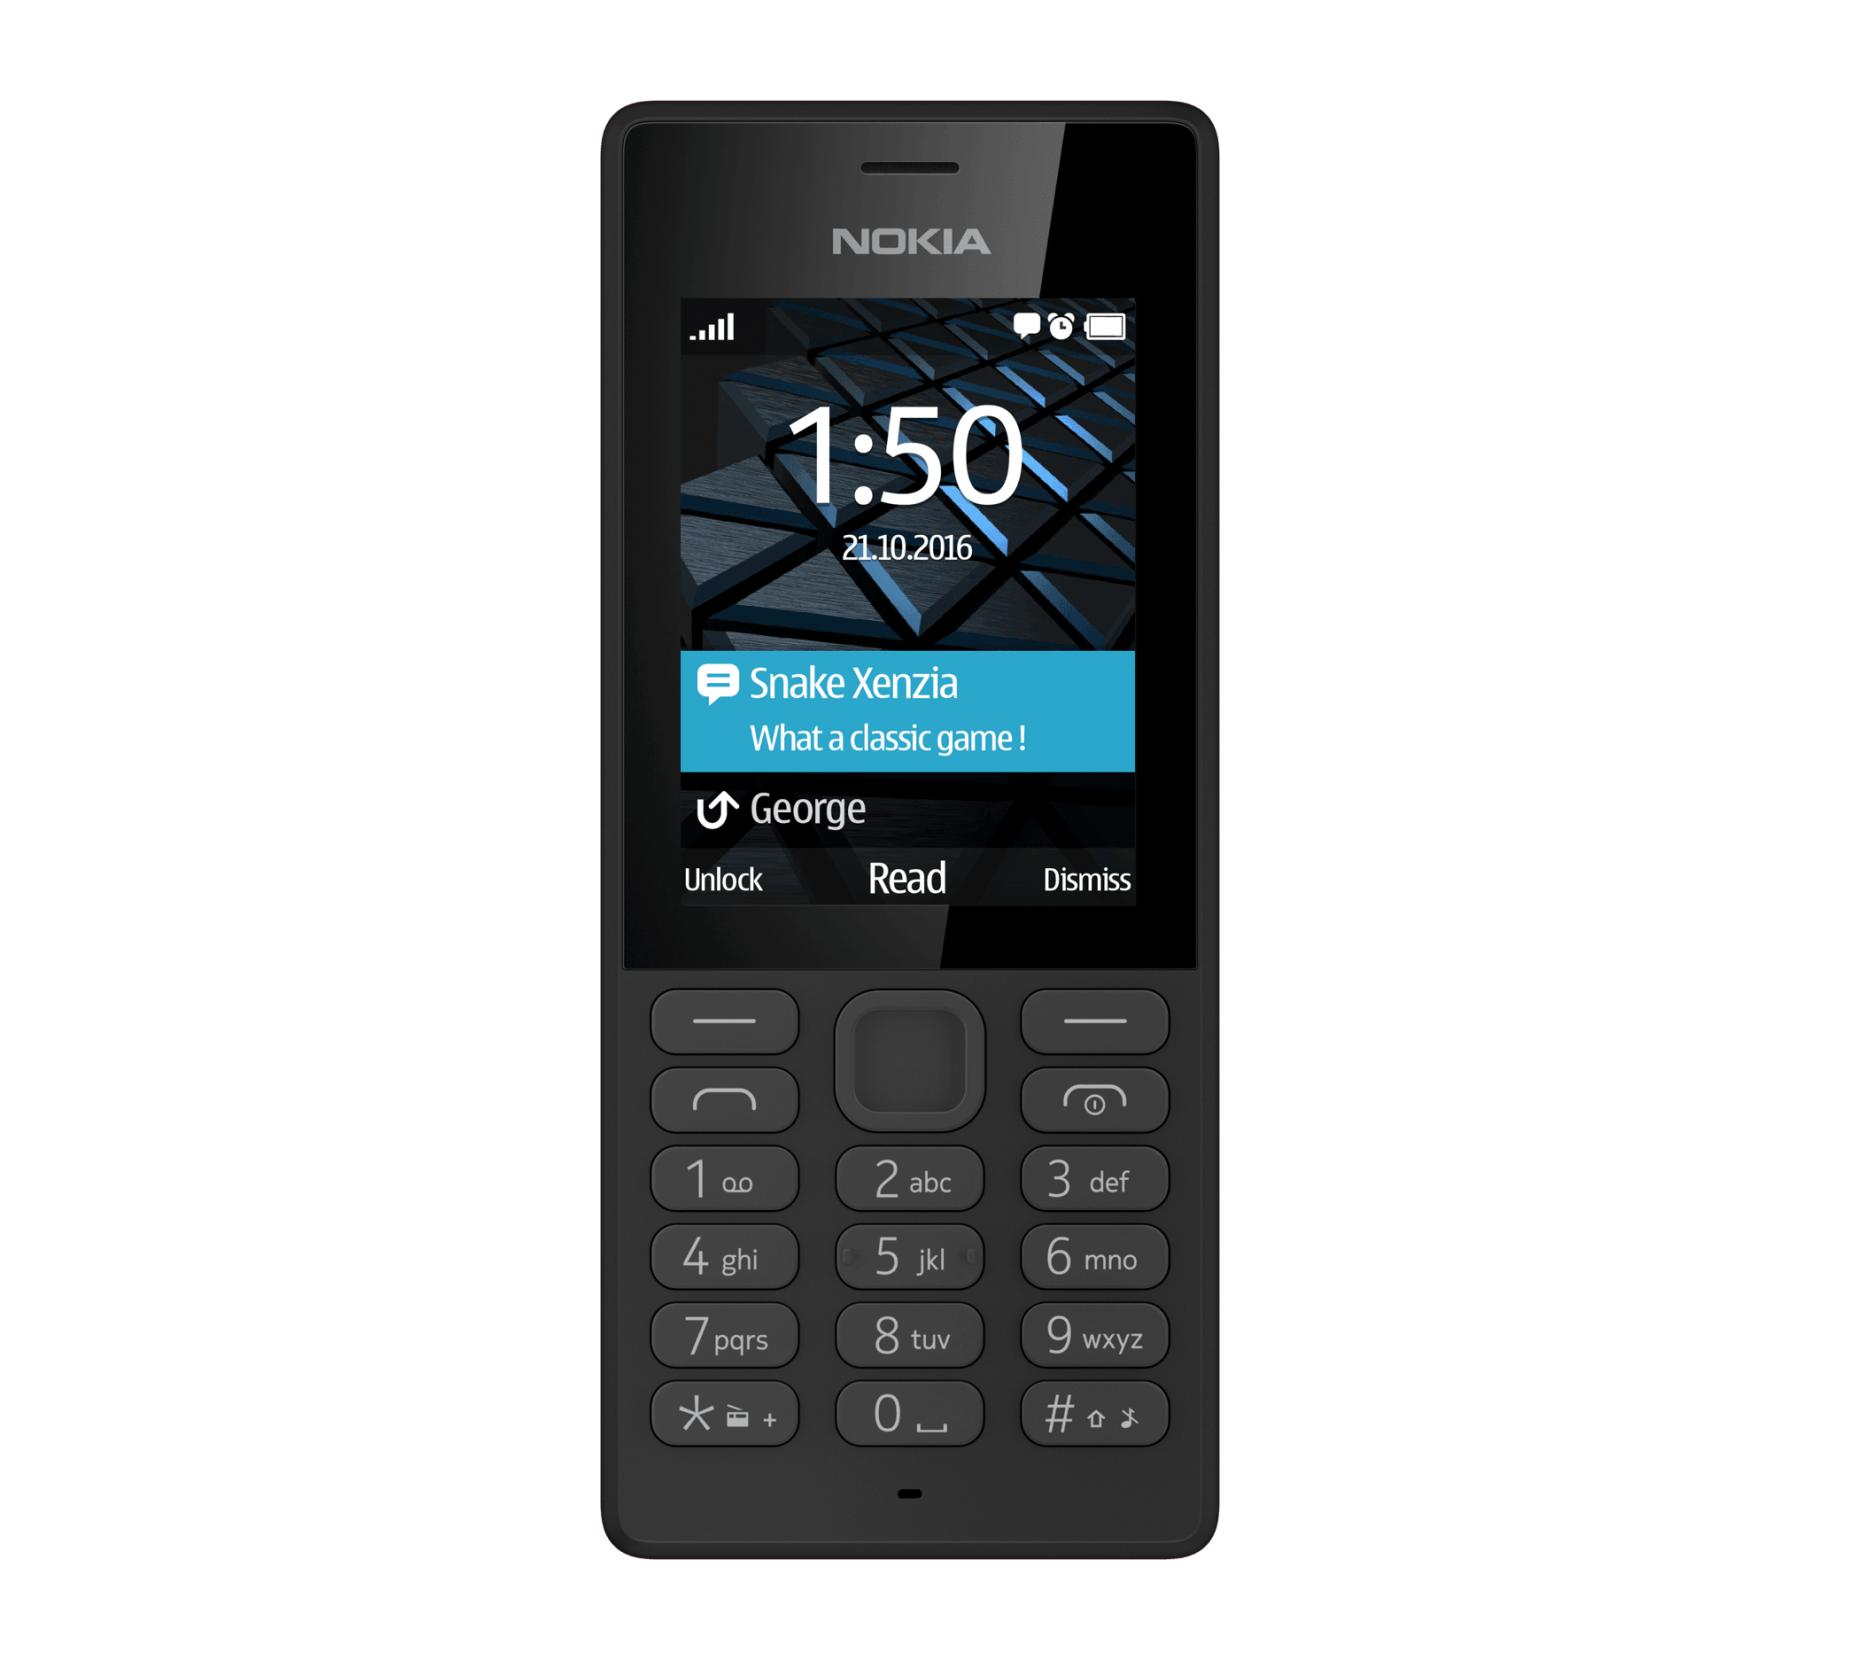 nokia phone 2016 price. nokia-150_12188.png nokia phone 2016 price